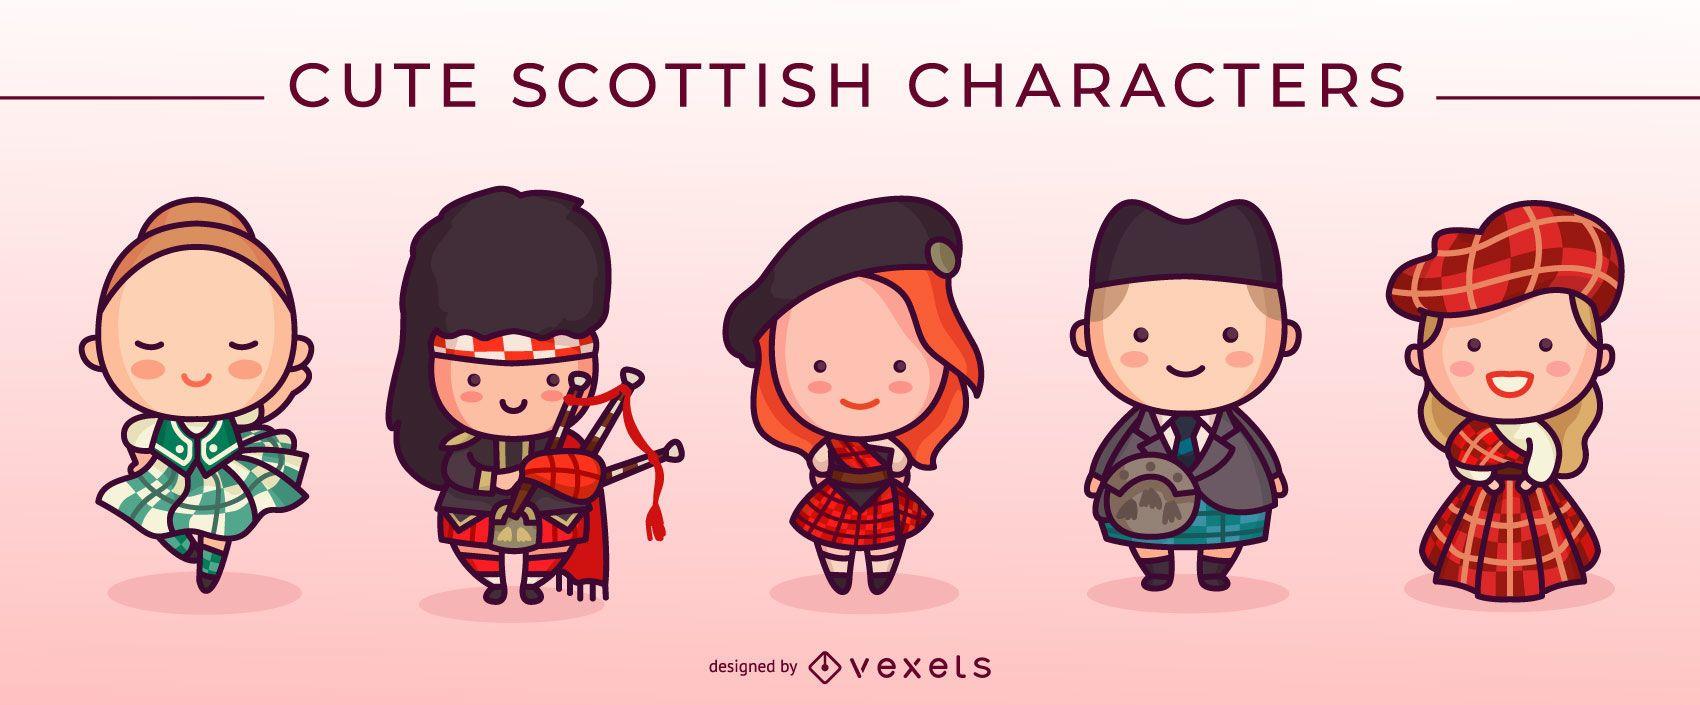 Cute scottish characters set